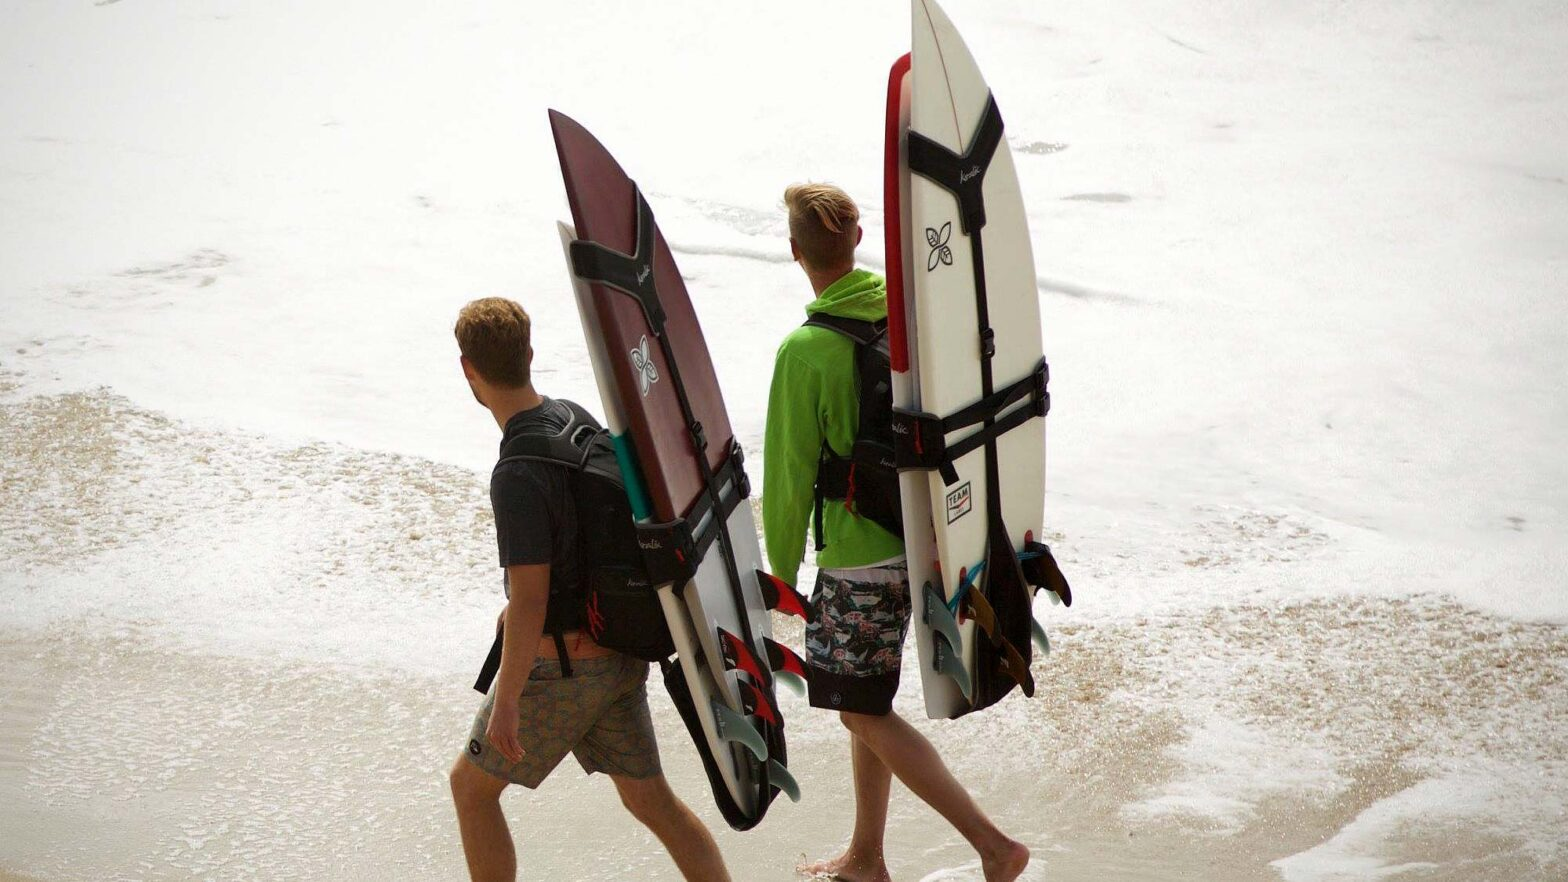 Koraloc Backpack for Carrying Surfboard